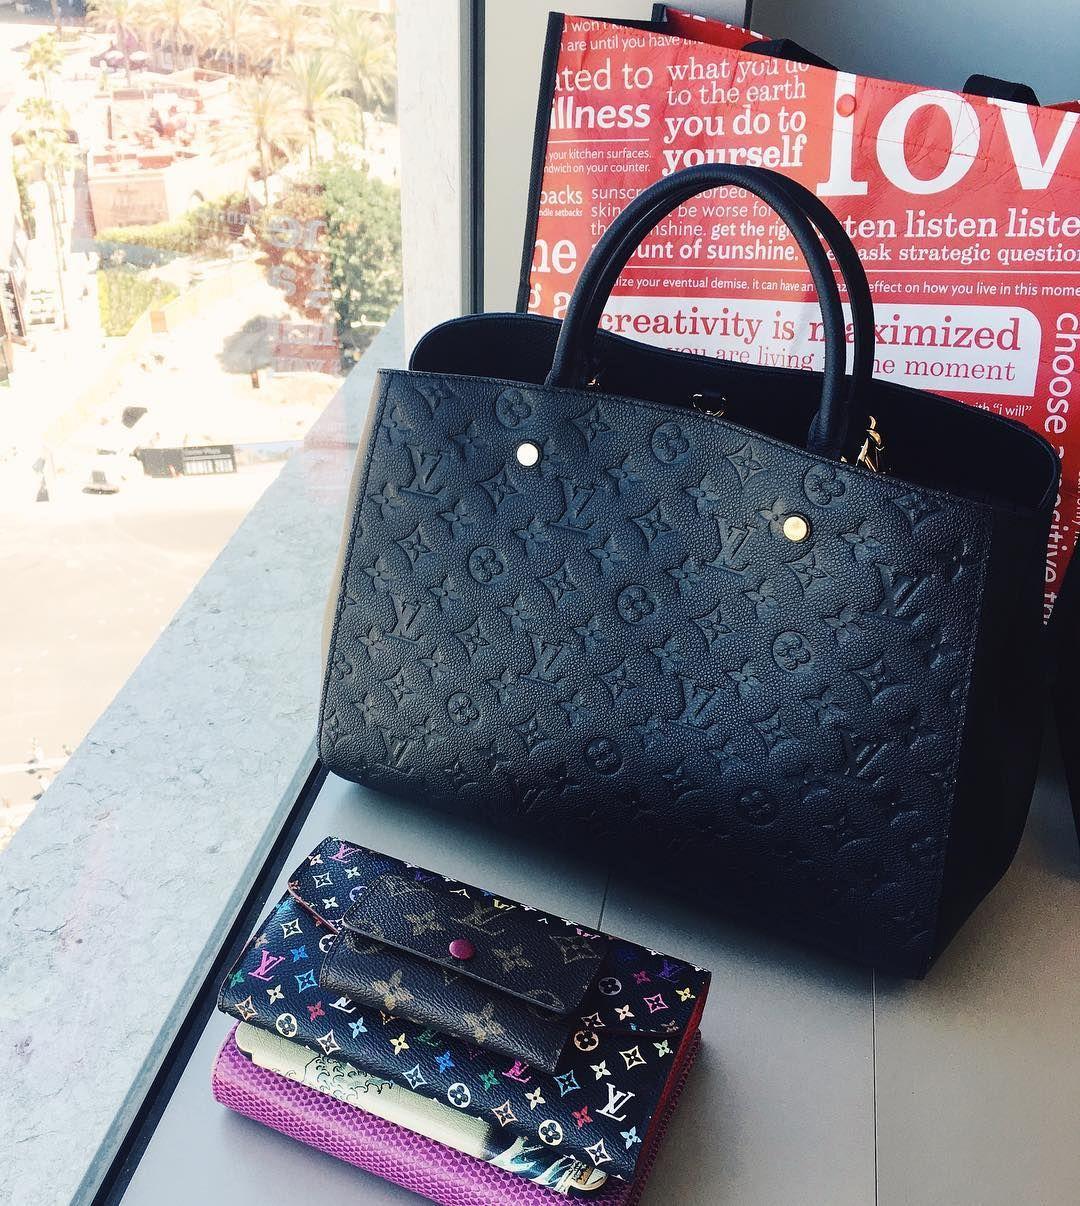 e981cdbf6fc7 Finally found my perfect work bag Louis Vuitton Montaigne Empreinte GM in  Black Noir 前几个礼拜试了几次chanel shopping tote怎么都觉得不敢放电脑怕包底塌掉 ...